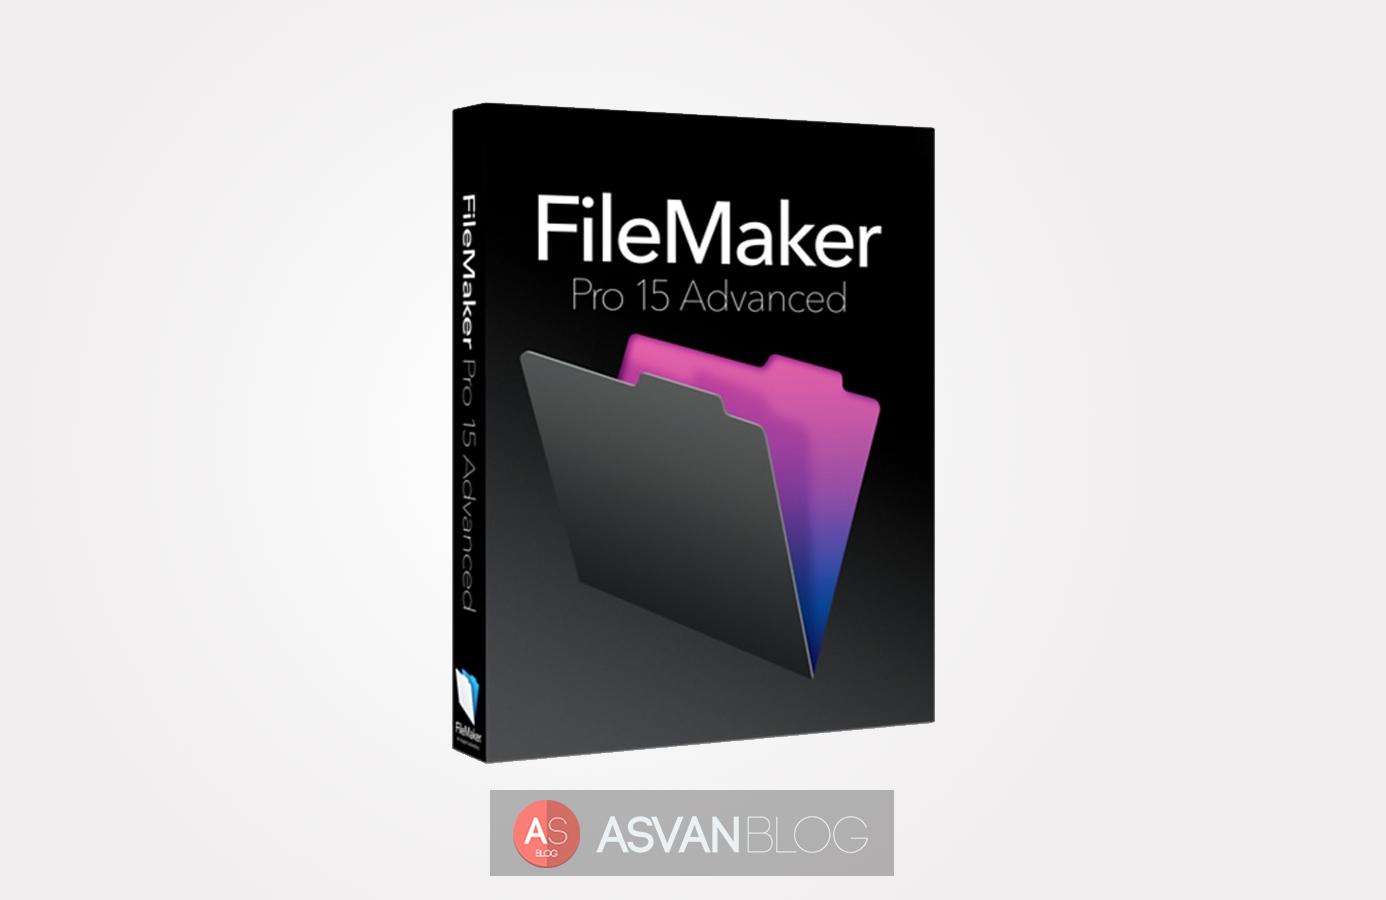 FileMaker Pro 15 Advanced price